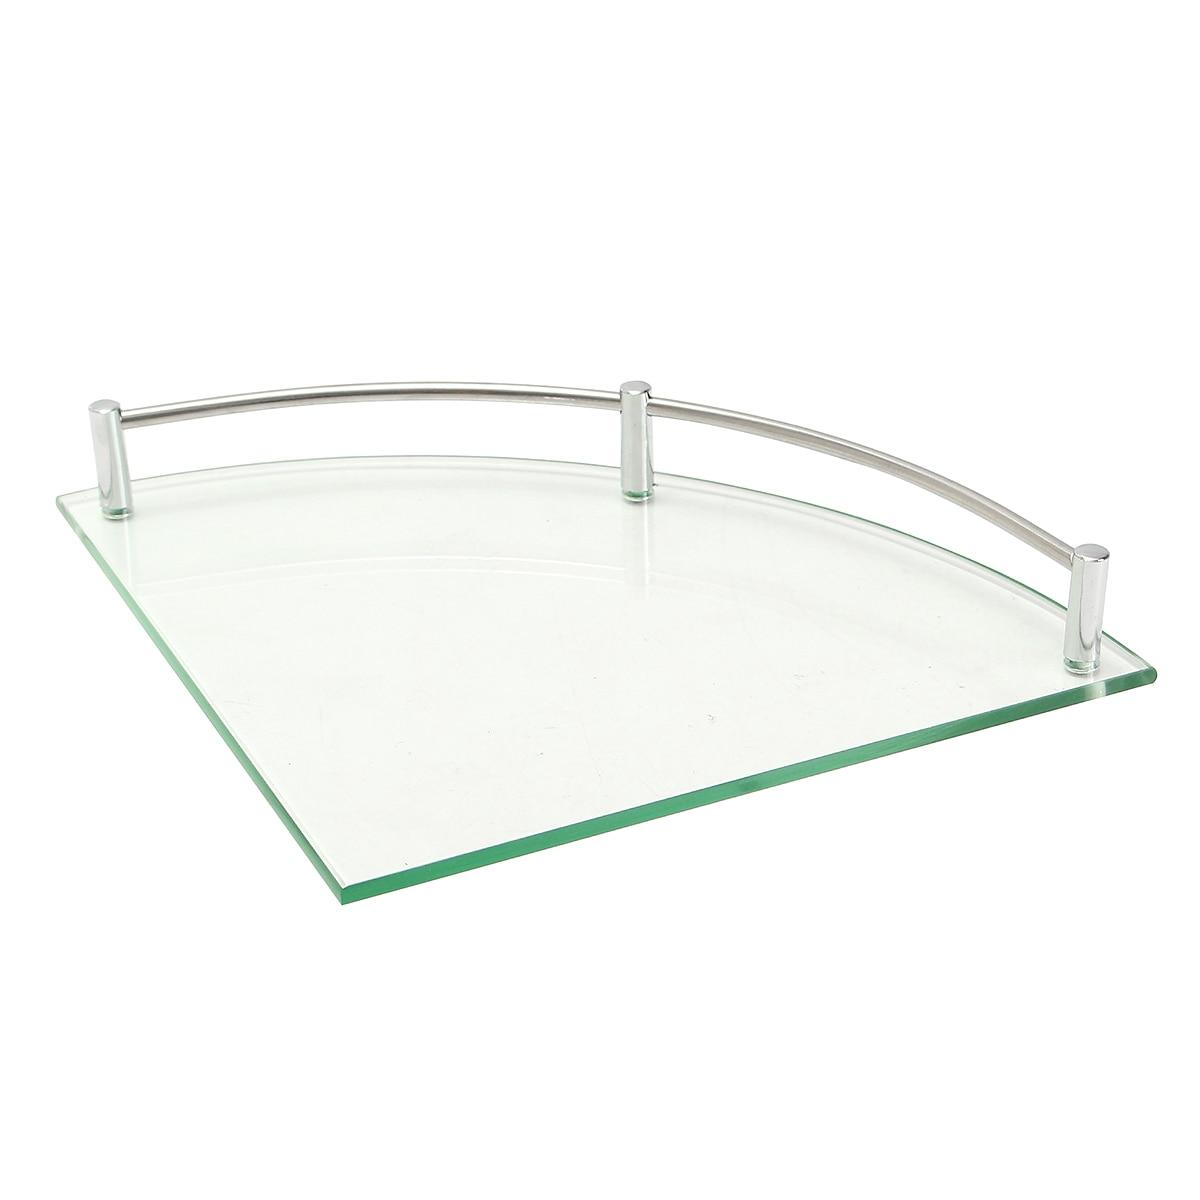 Bathroom Glass Bath Shower Triangular Shelf Holder Organizer Single Layer Modern Style Glass Bathroom Shelves